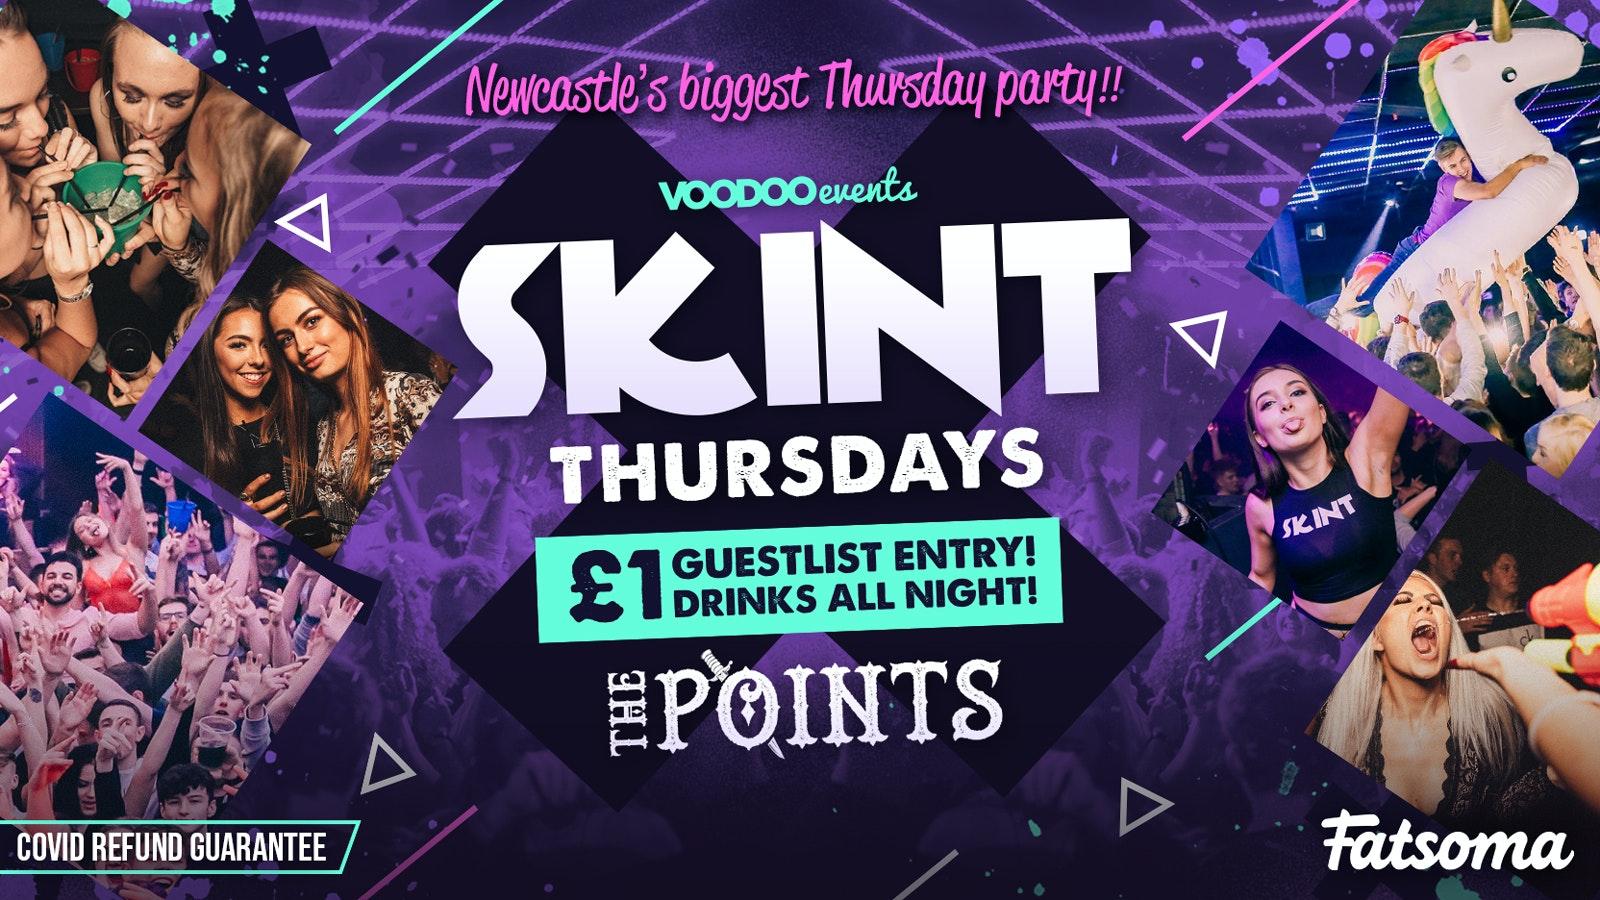 Skint  |  £1 Tickets & £1 Drinks